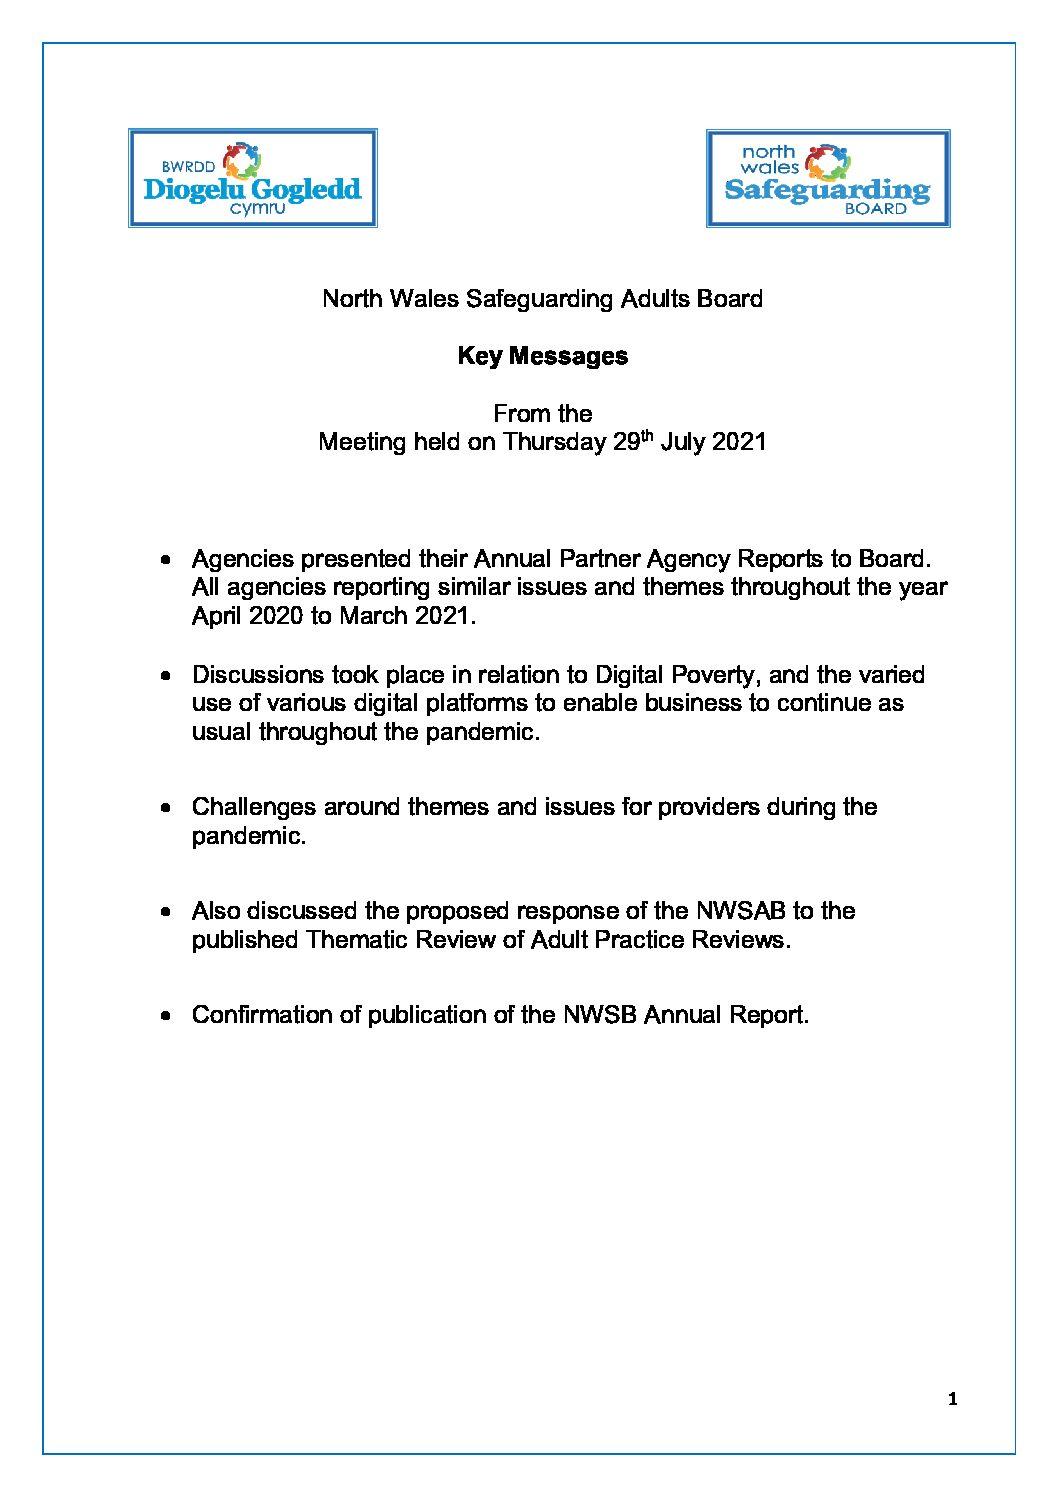 NWSAB Key Messages July 2021